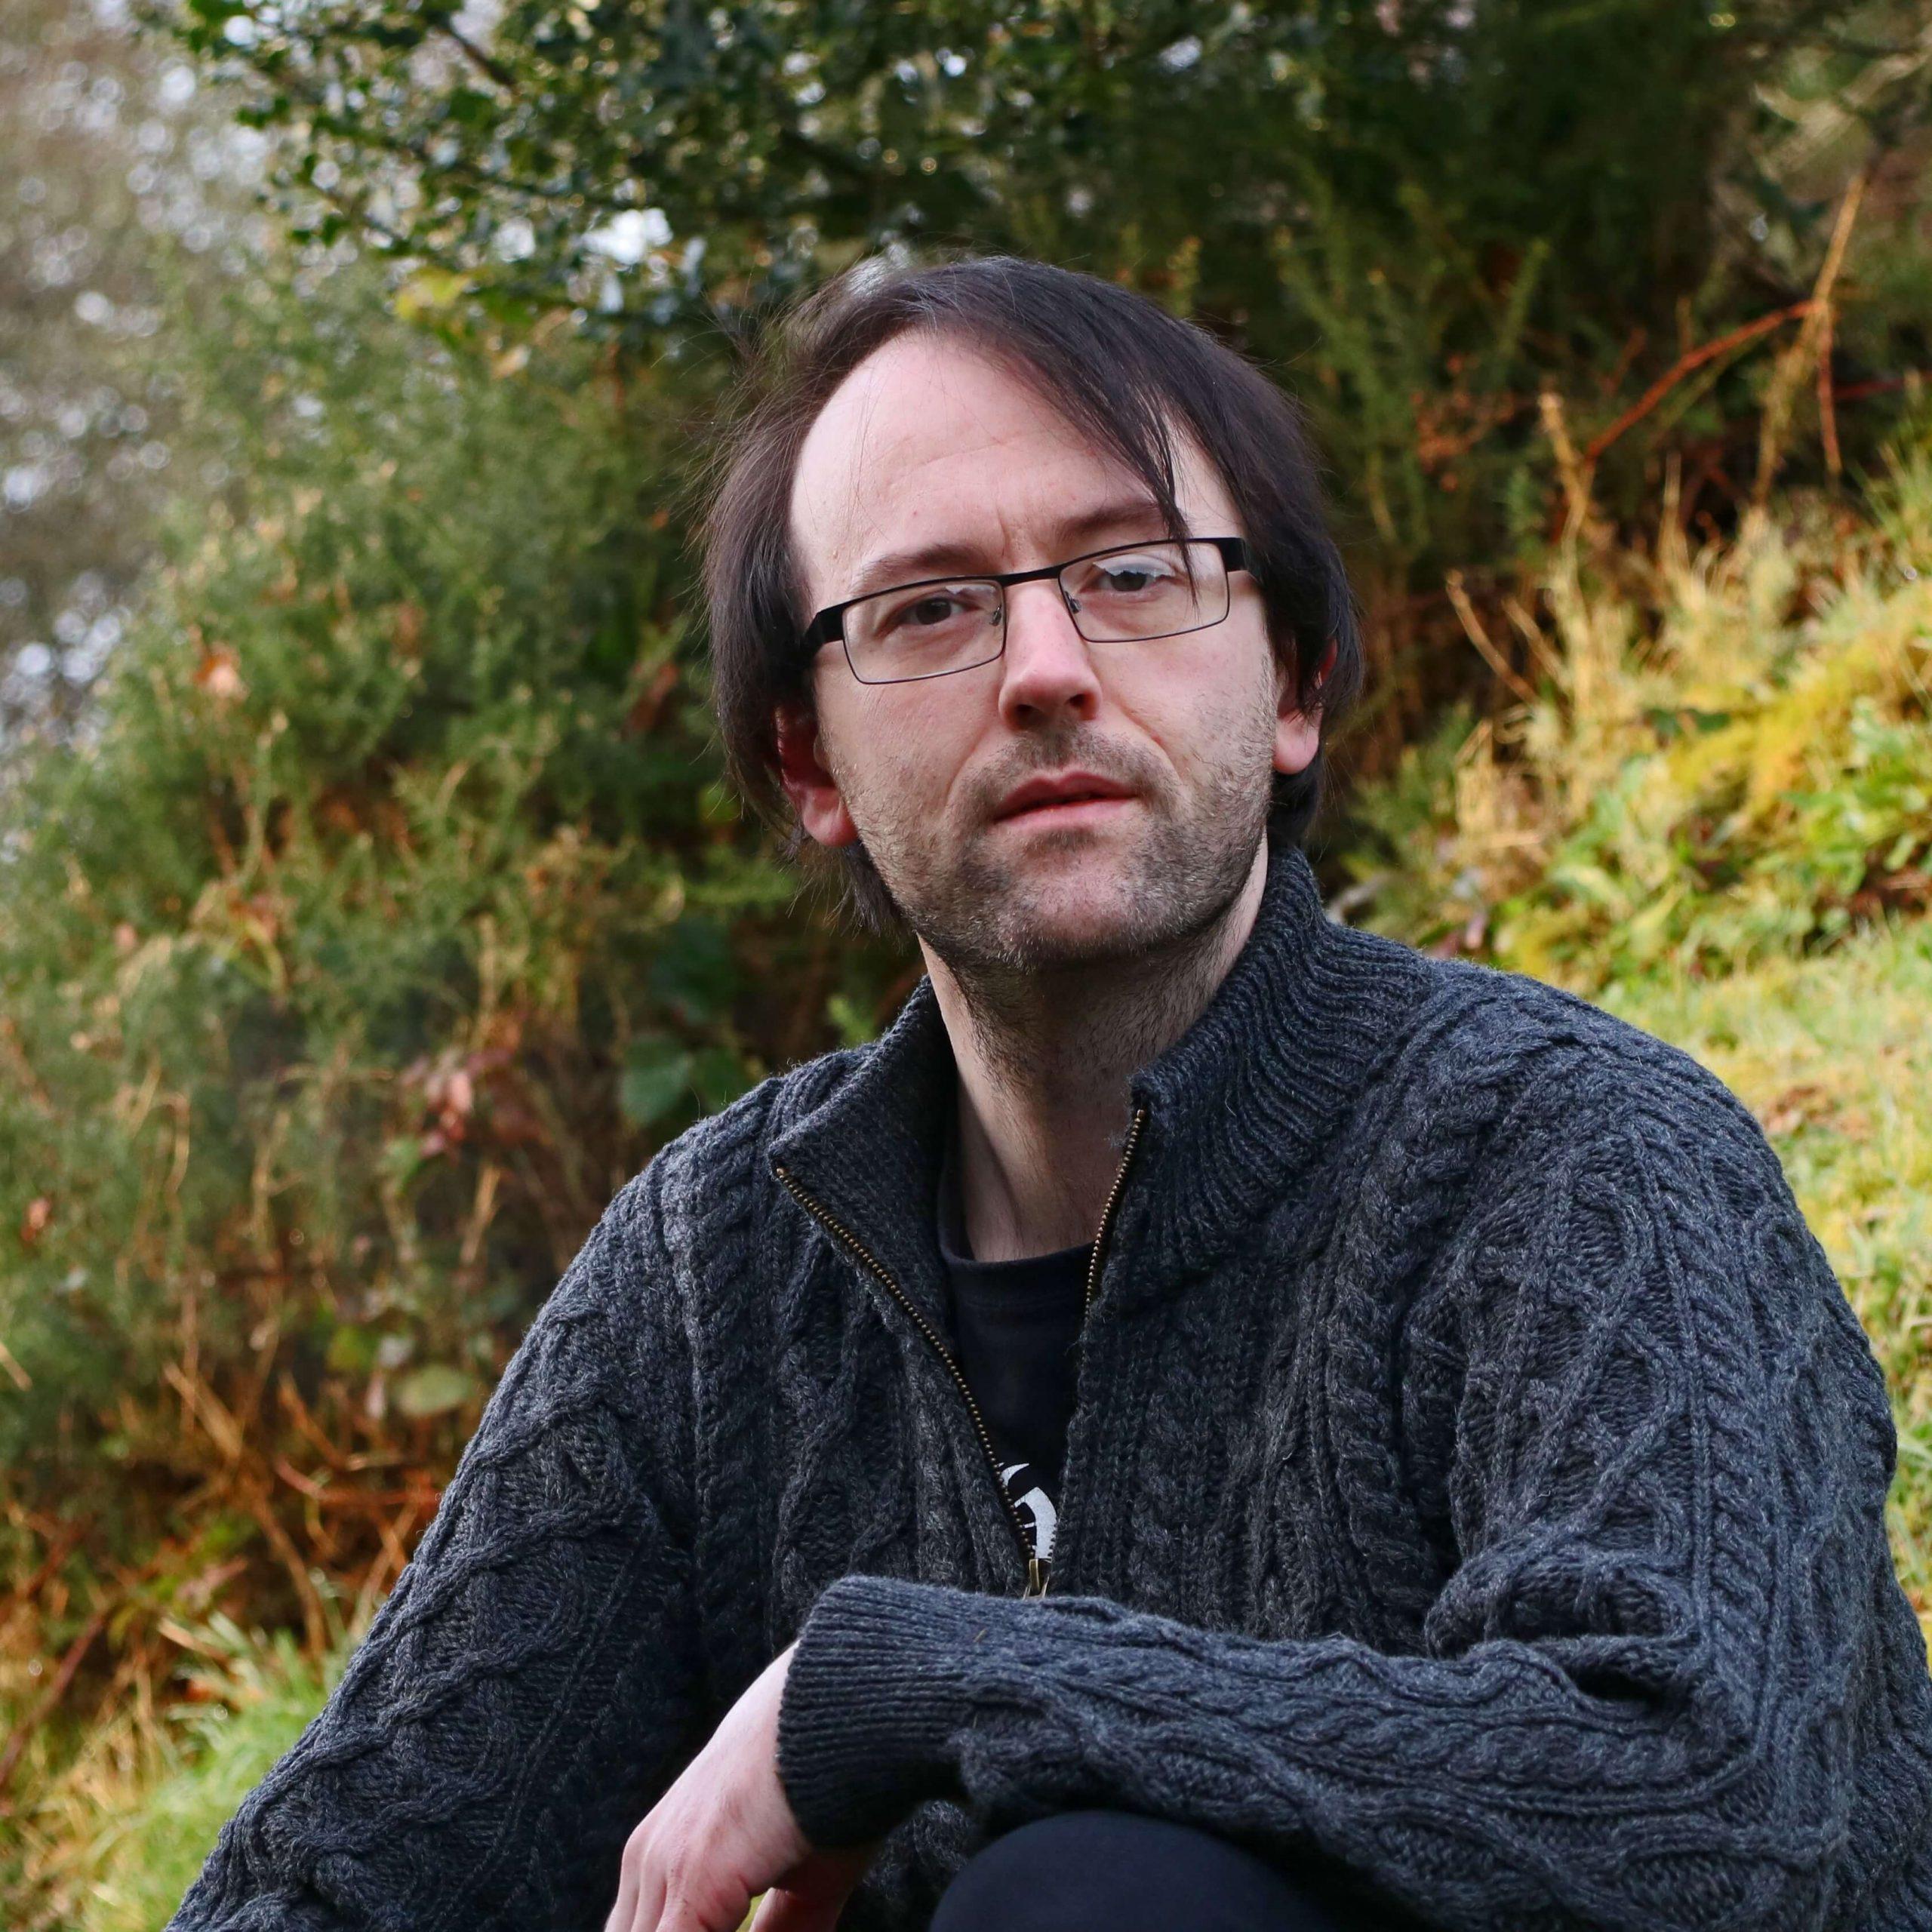 Aaron McGee, Digital Designer